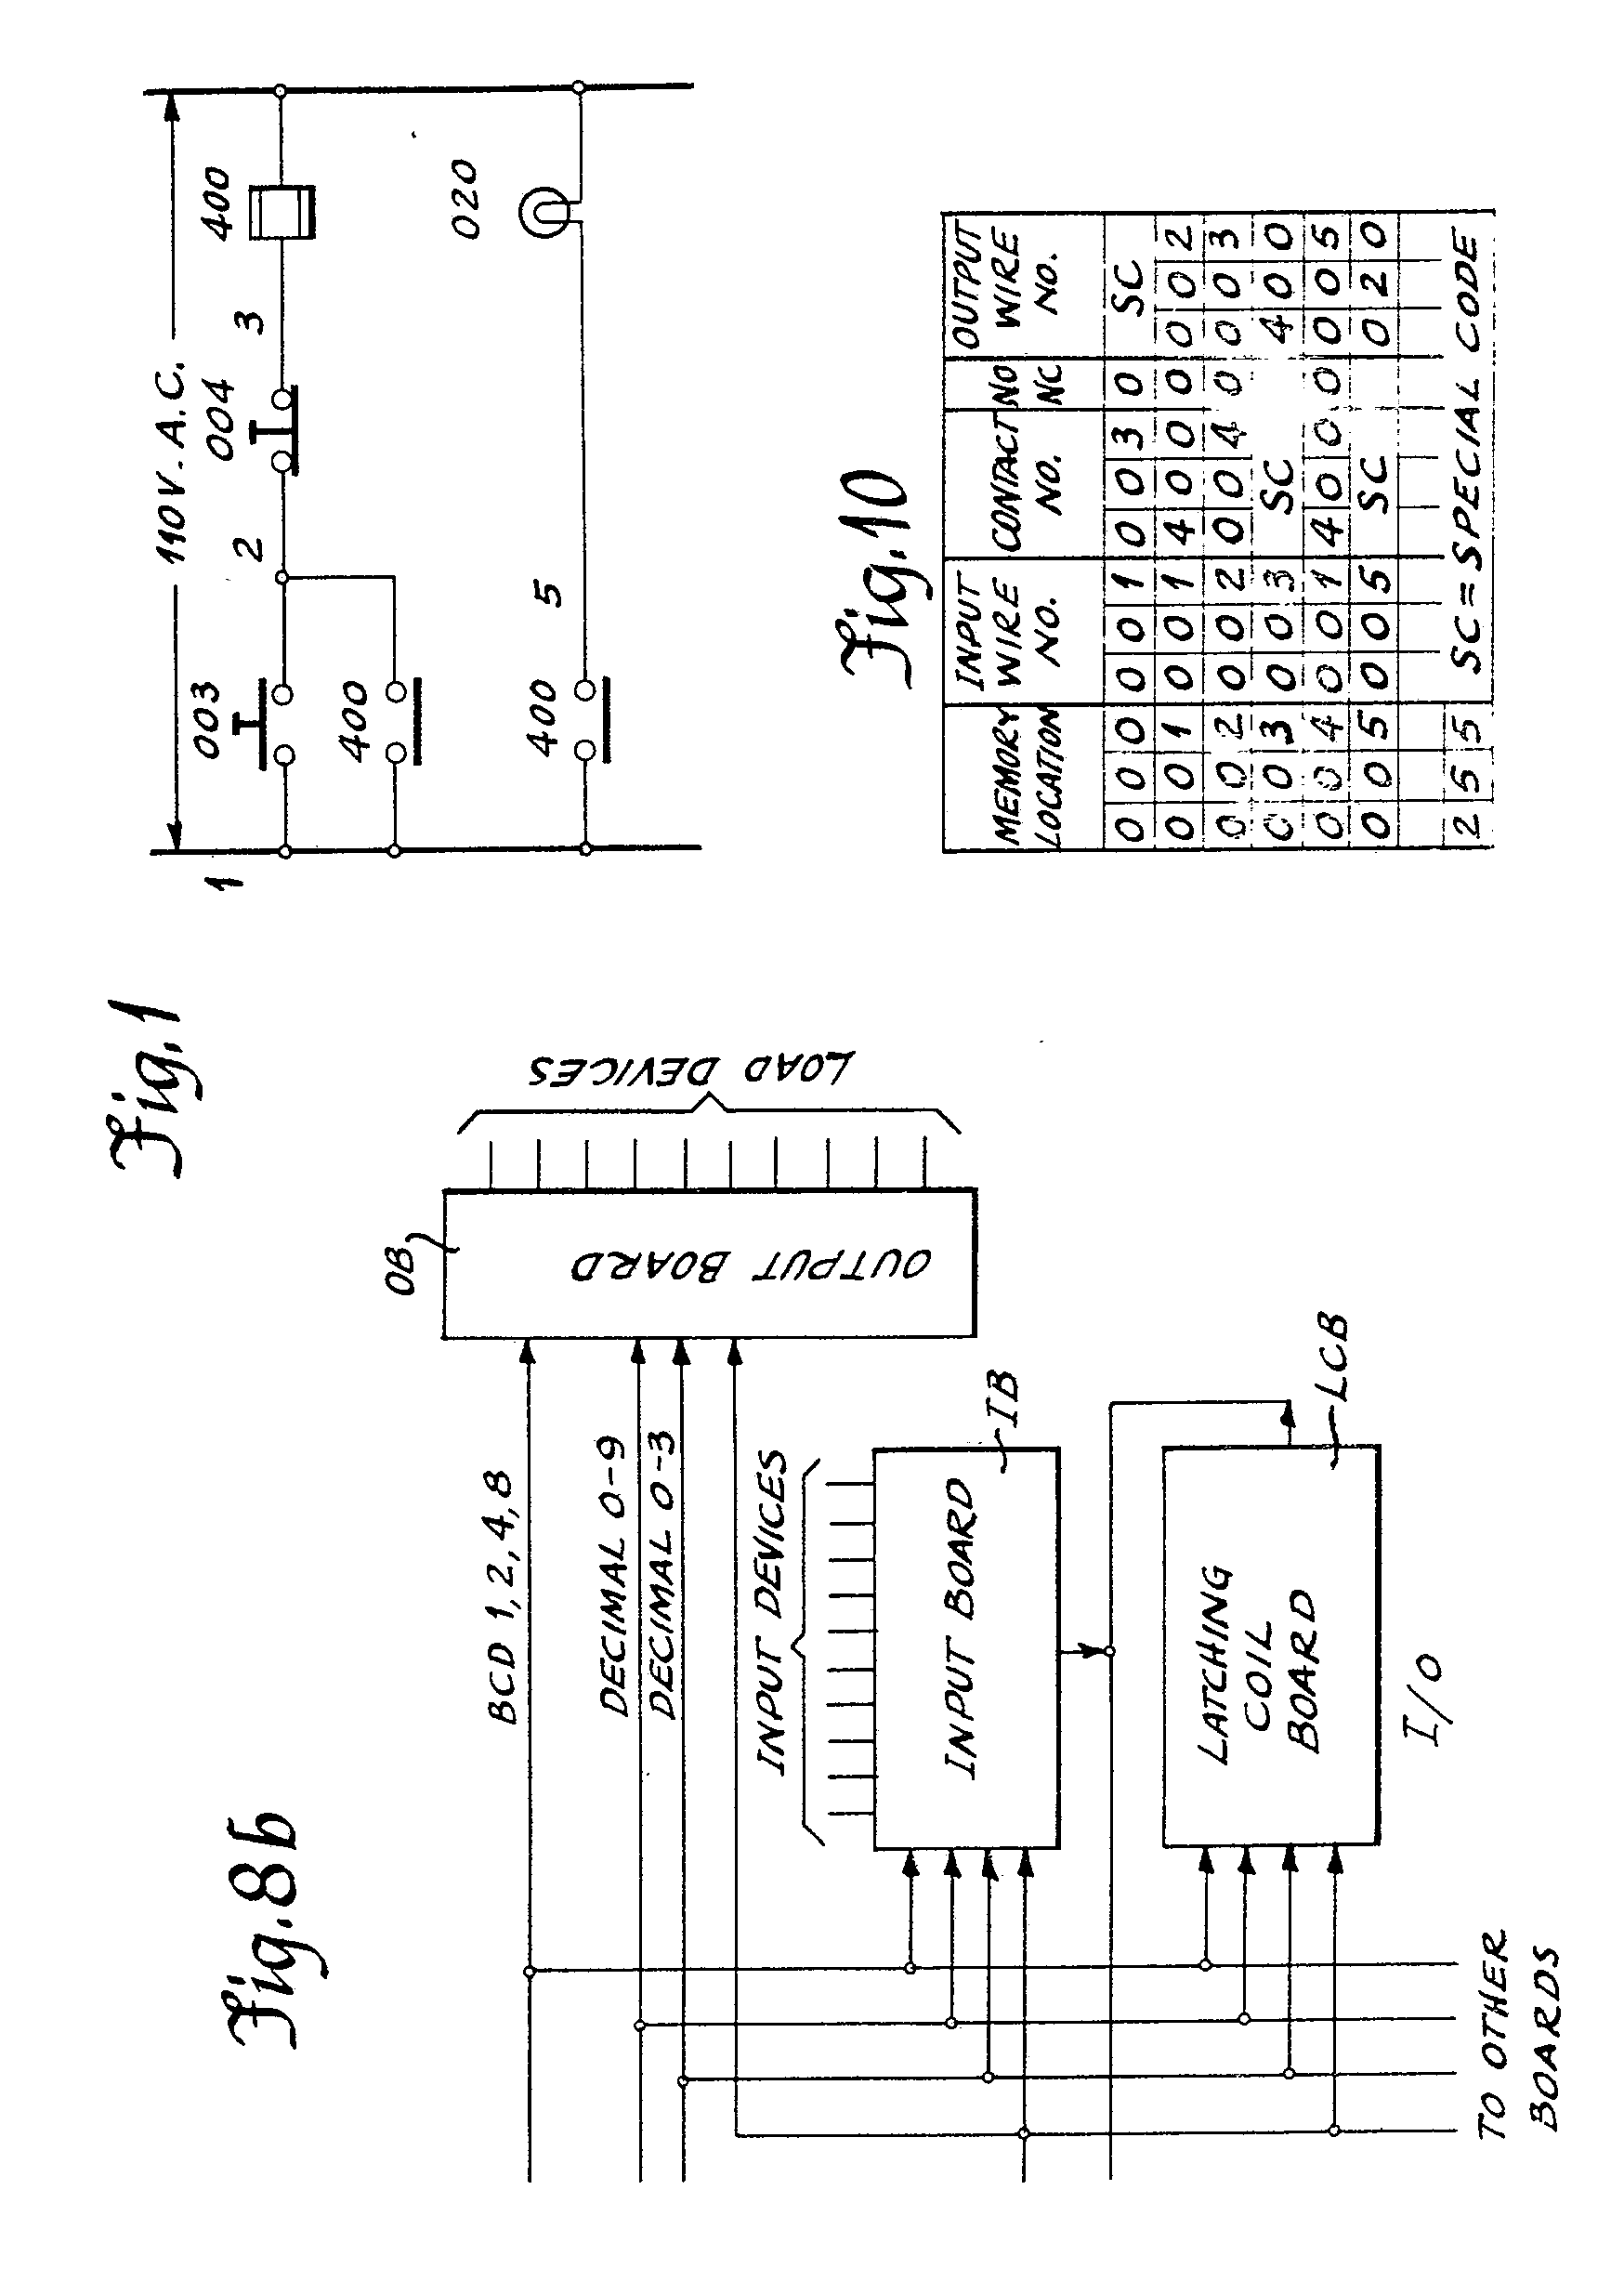 programmable logic control diagram